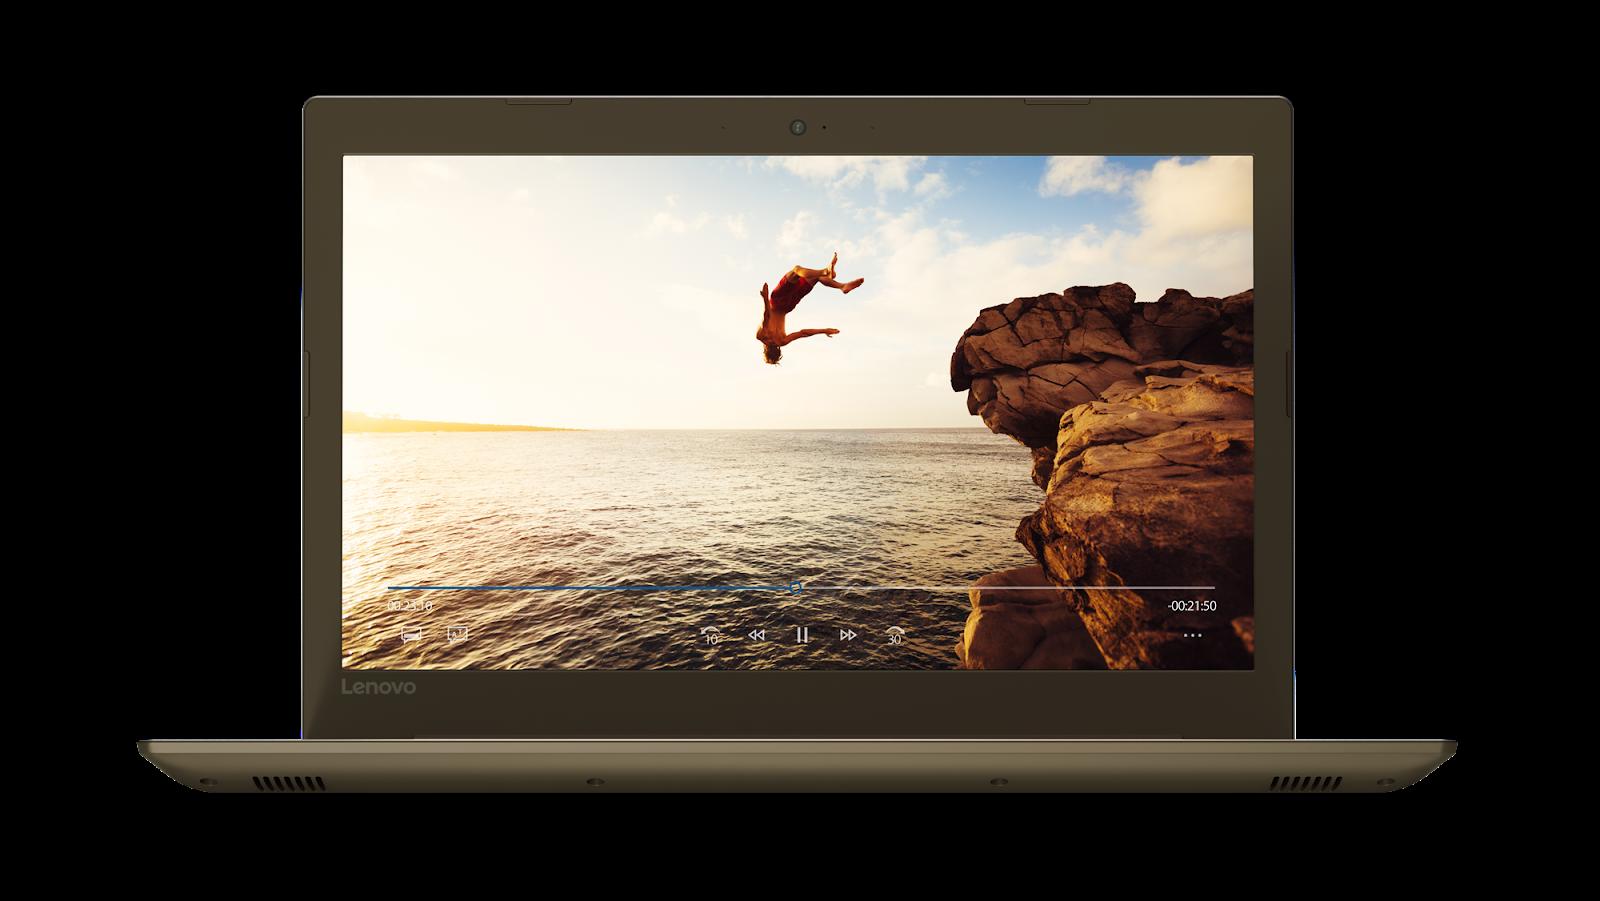 Фото 3 - Ноутбук Lenovo IdeaPad 520-15IKB Bronze (80YL00STRA)